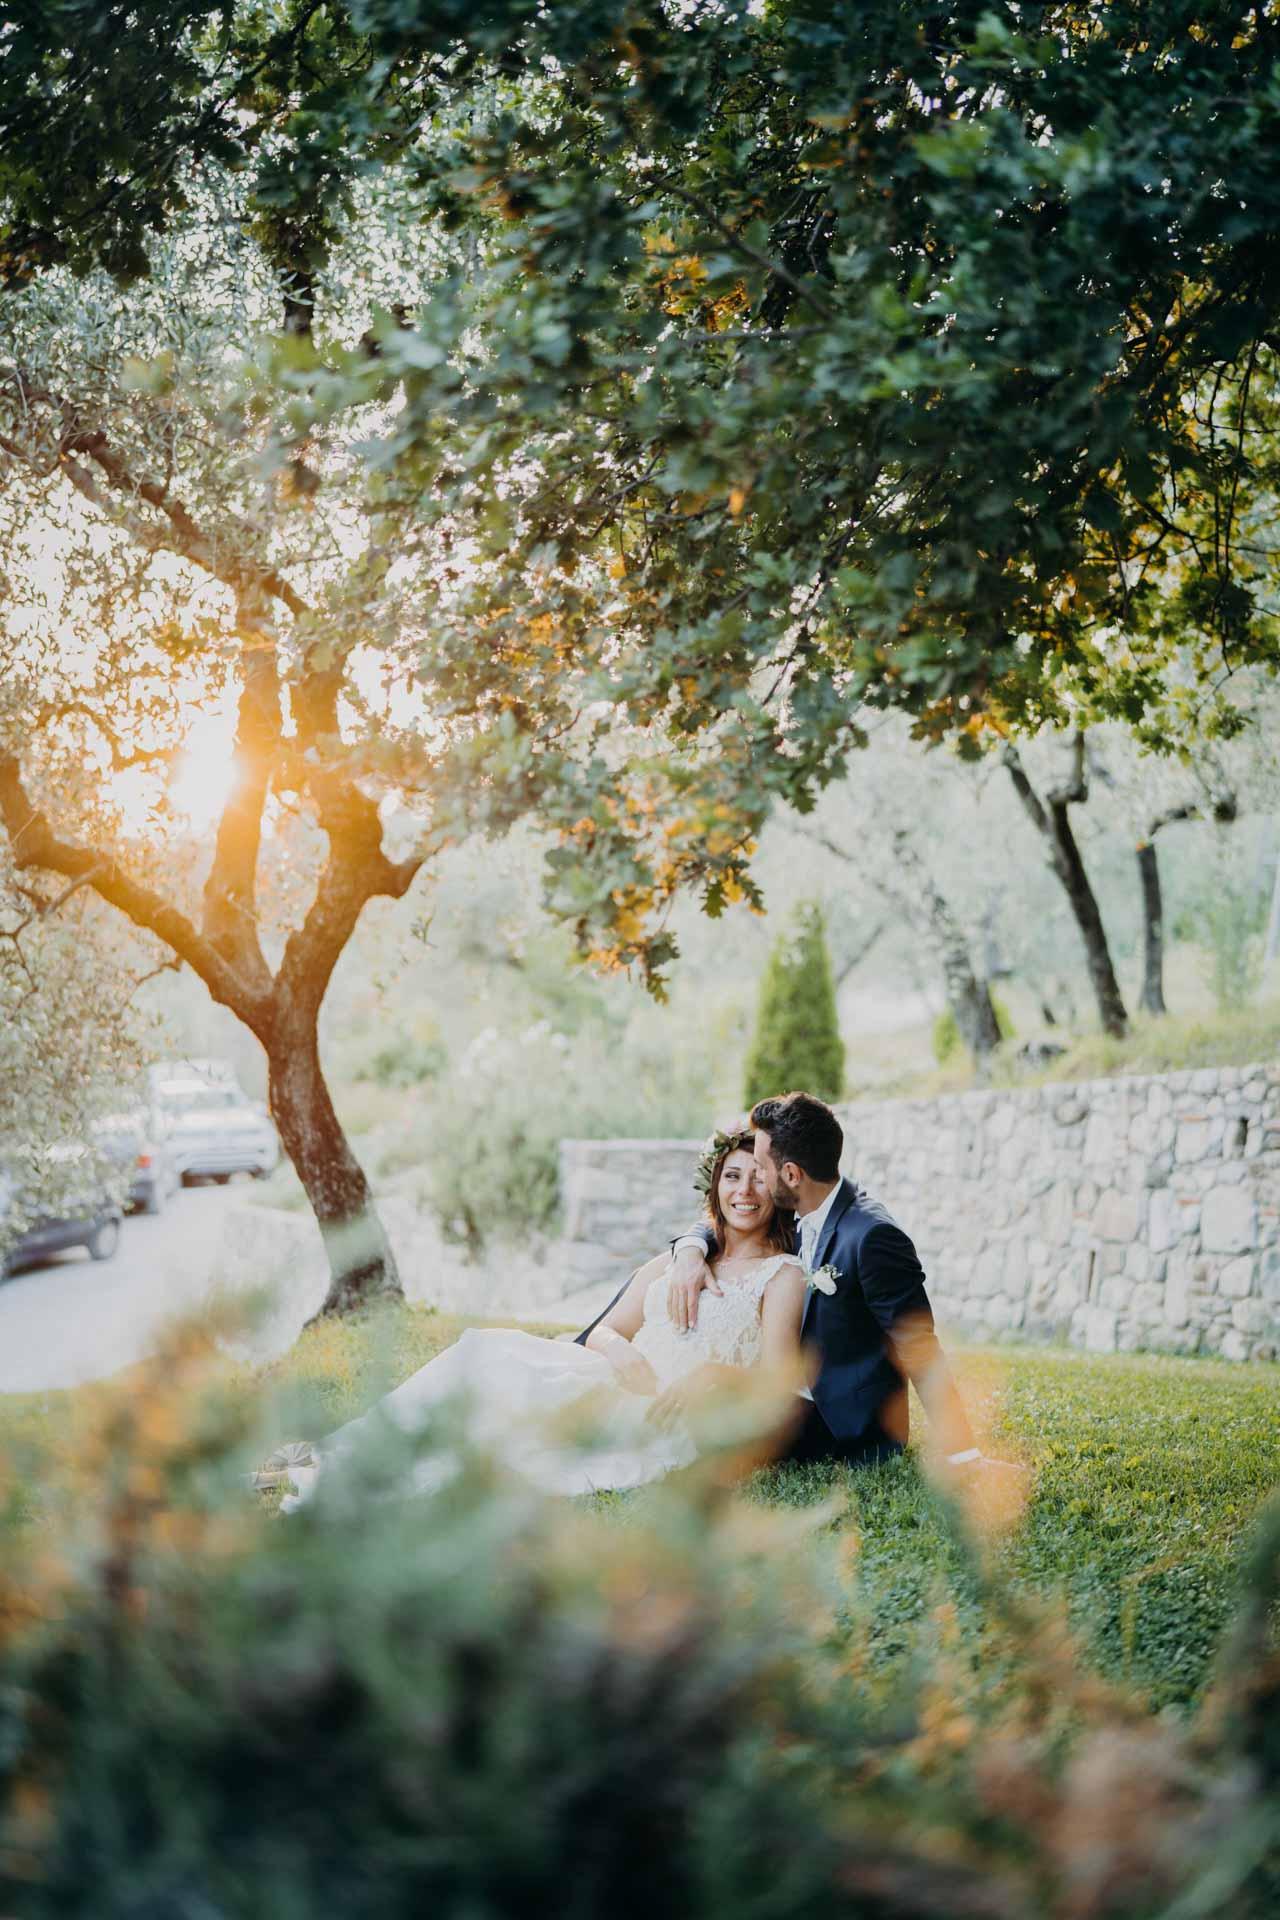 fotografo_matrimonio_toscana_poggio_tondo_92